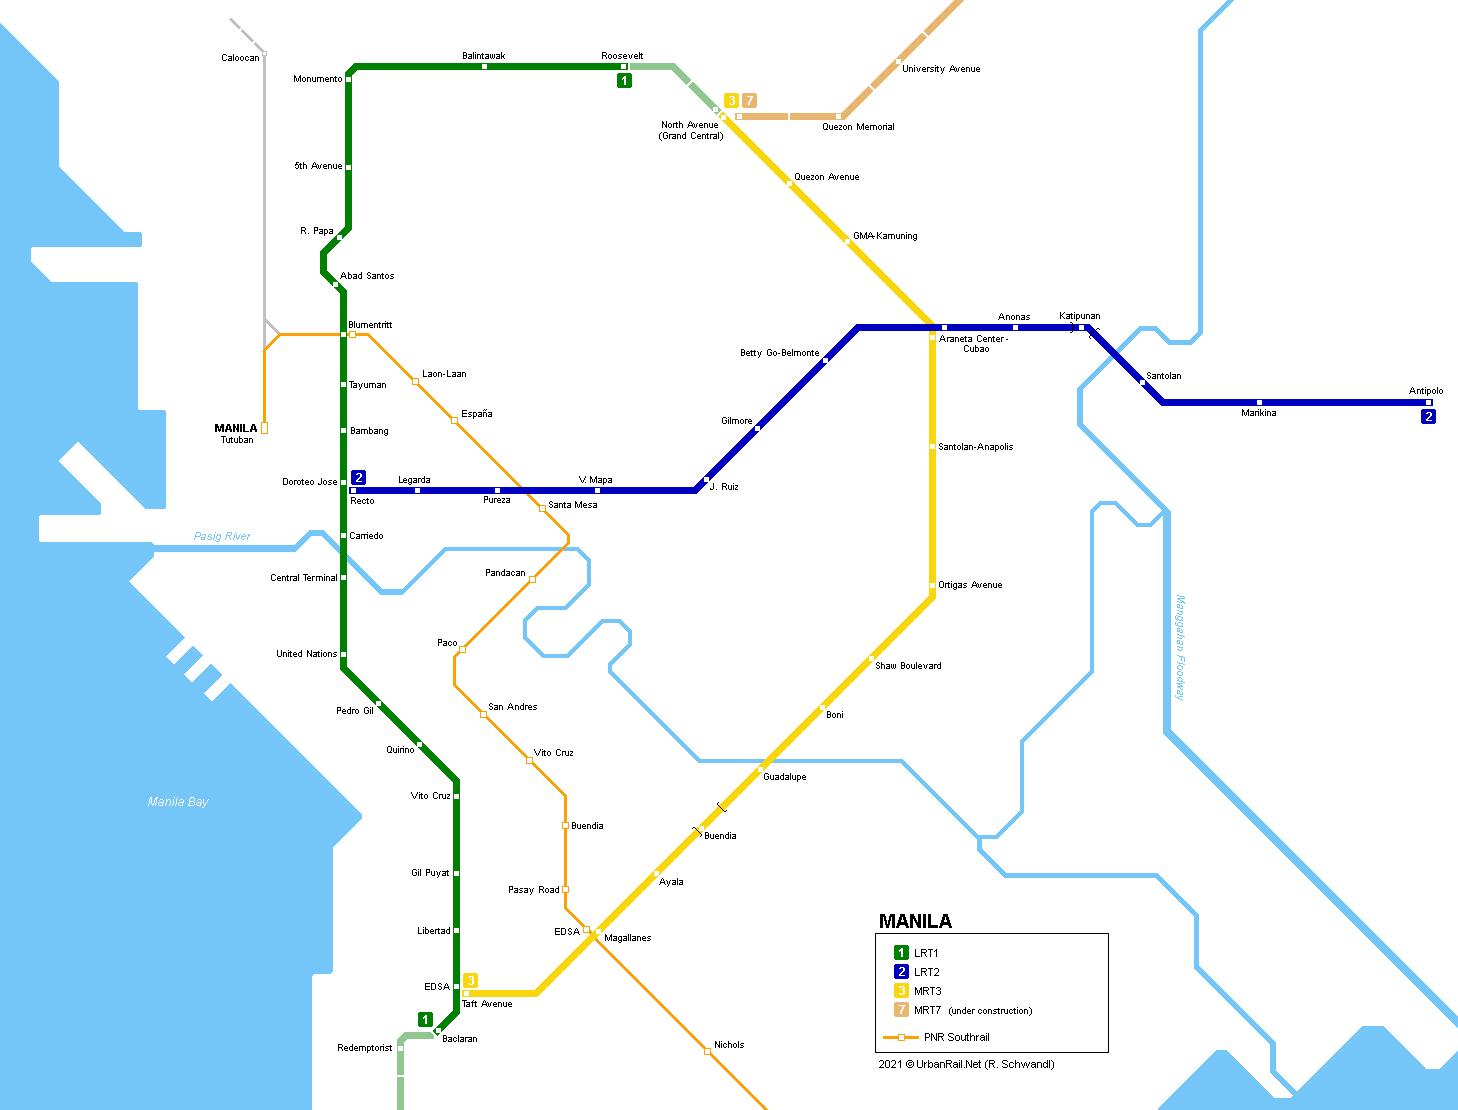 Mega Manila Subway Map.Urbanrail Net Asia Philippinges Manila Lrt Metro